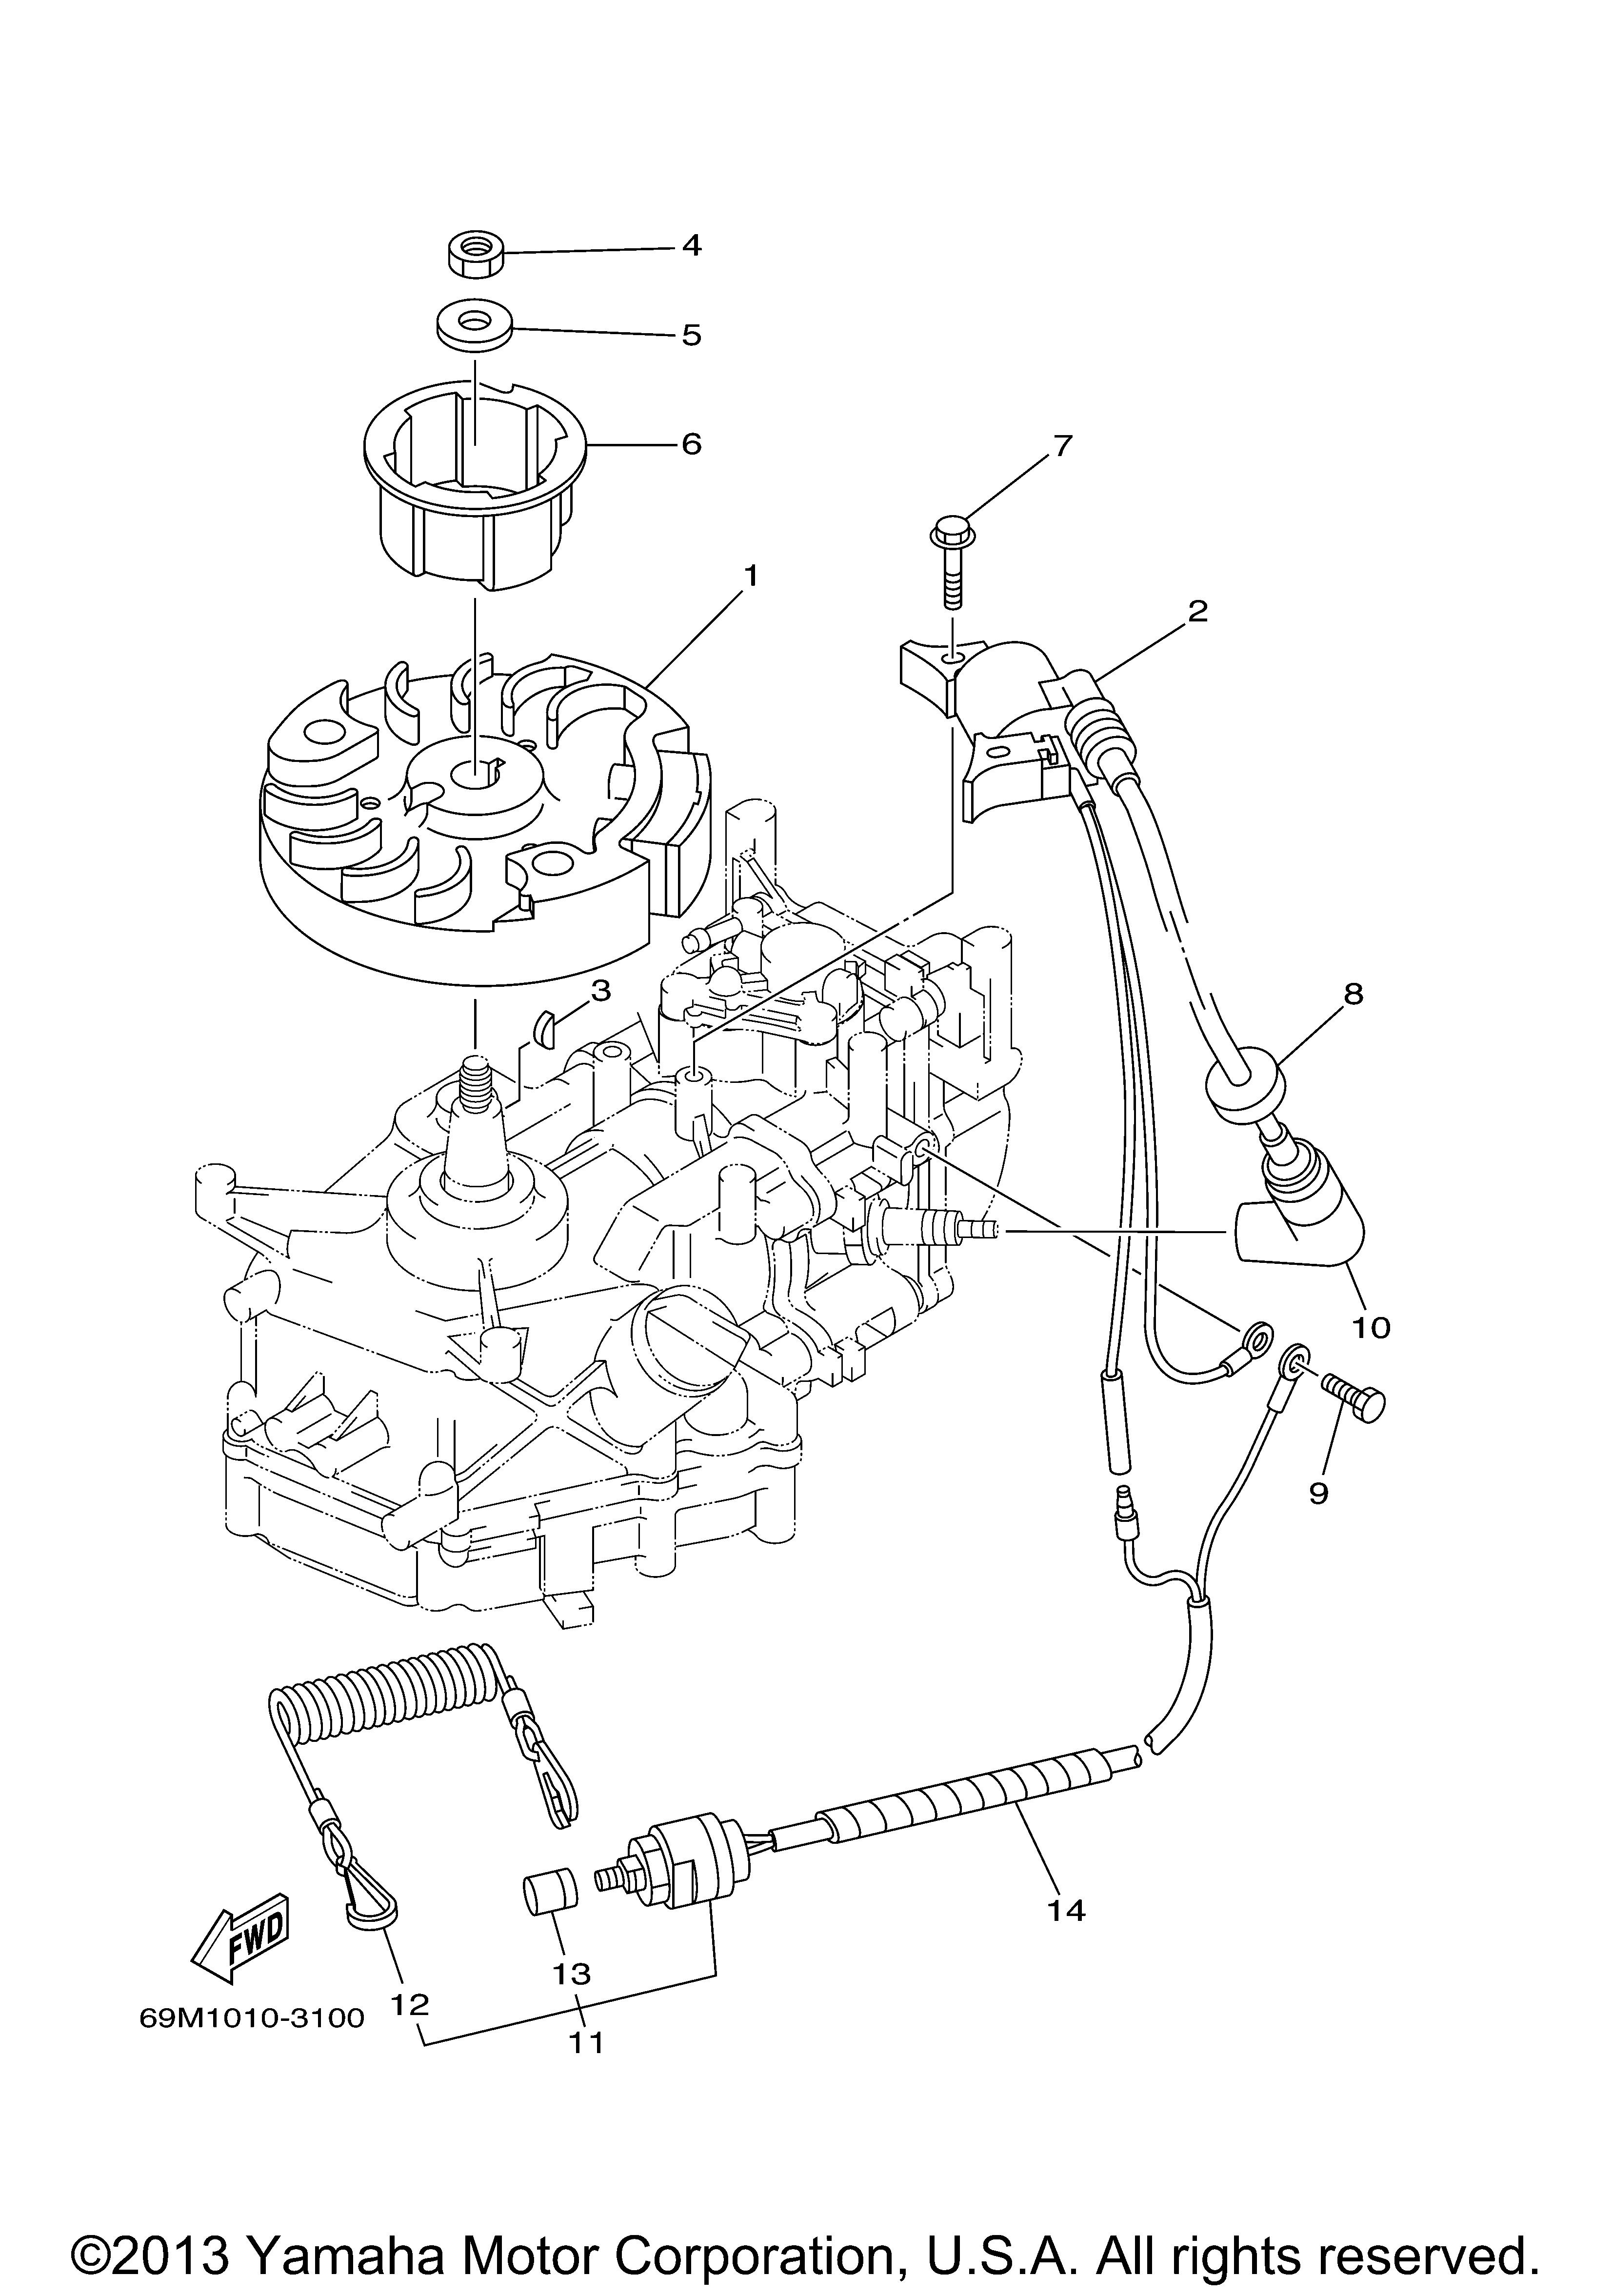 Yamaha Outboard 25 Hp F25smha 0 Generator 3100 Engine Diagram